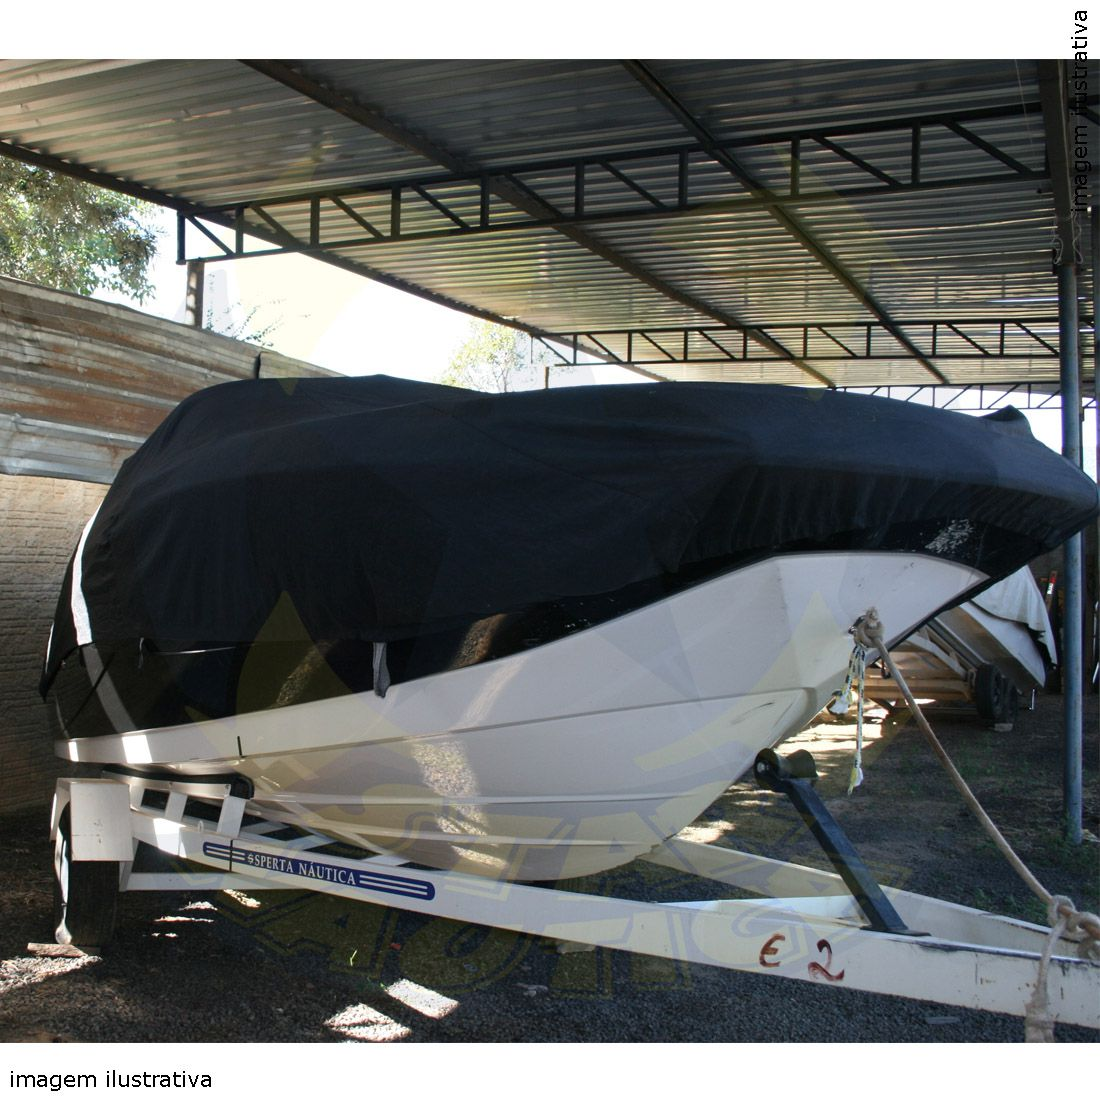 Capa Lona de Cobertura Lancha Focker 222 Lona Vinílica